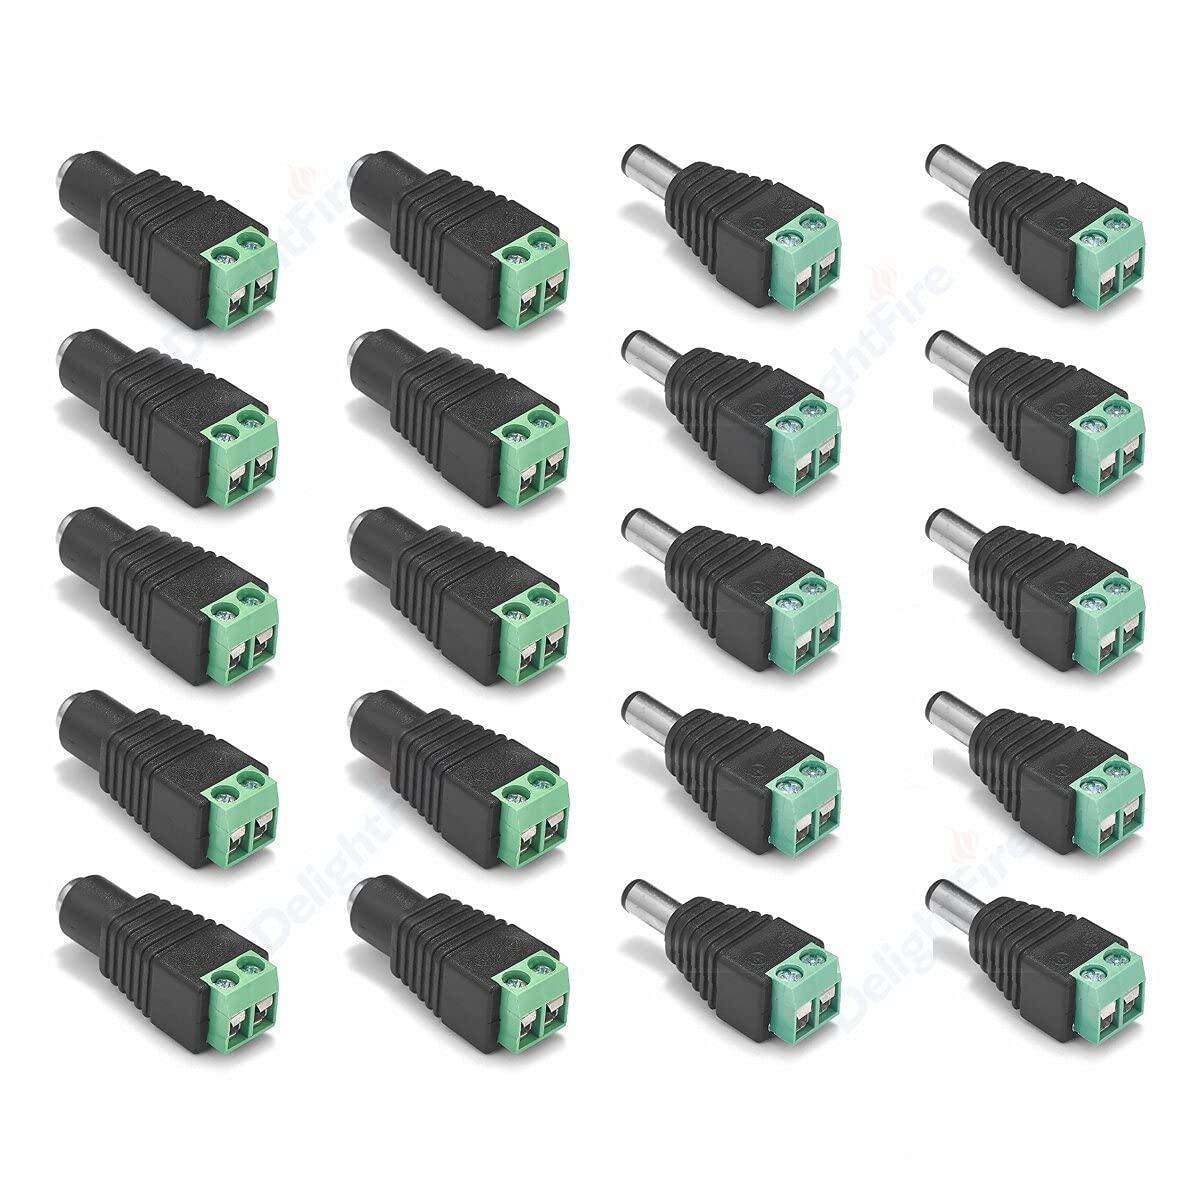 KIMLLOYD Ranking TOP19 5-100pcs Female Male Manufacturer OFFicial shop DC 5.52.1mm 5V Jack Connectors